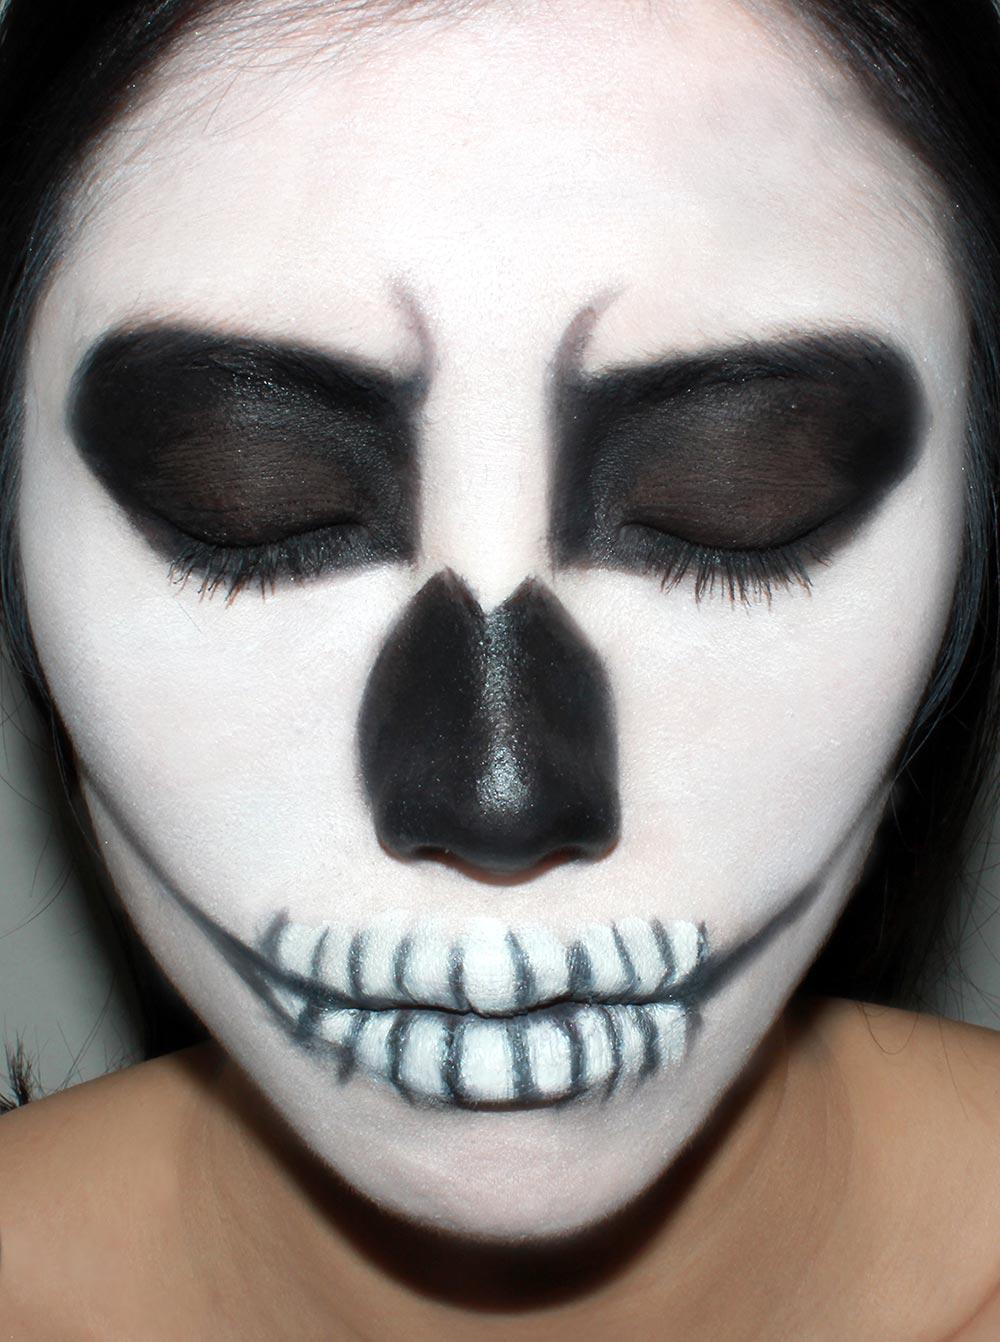 Genoeg Beauty for you: Halloween make-up &UH76